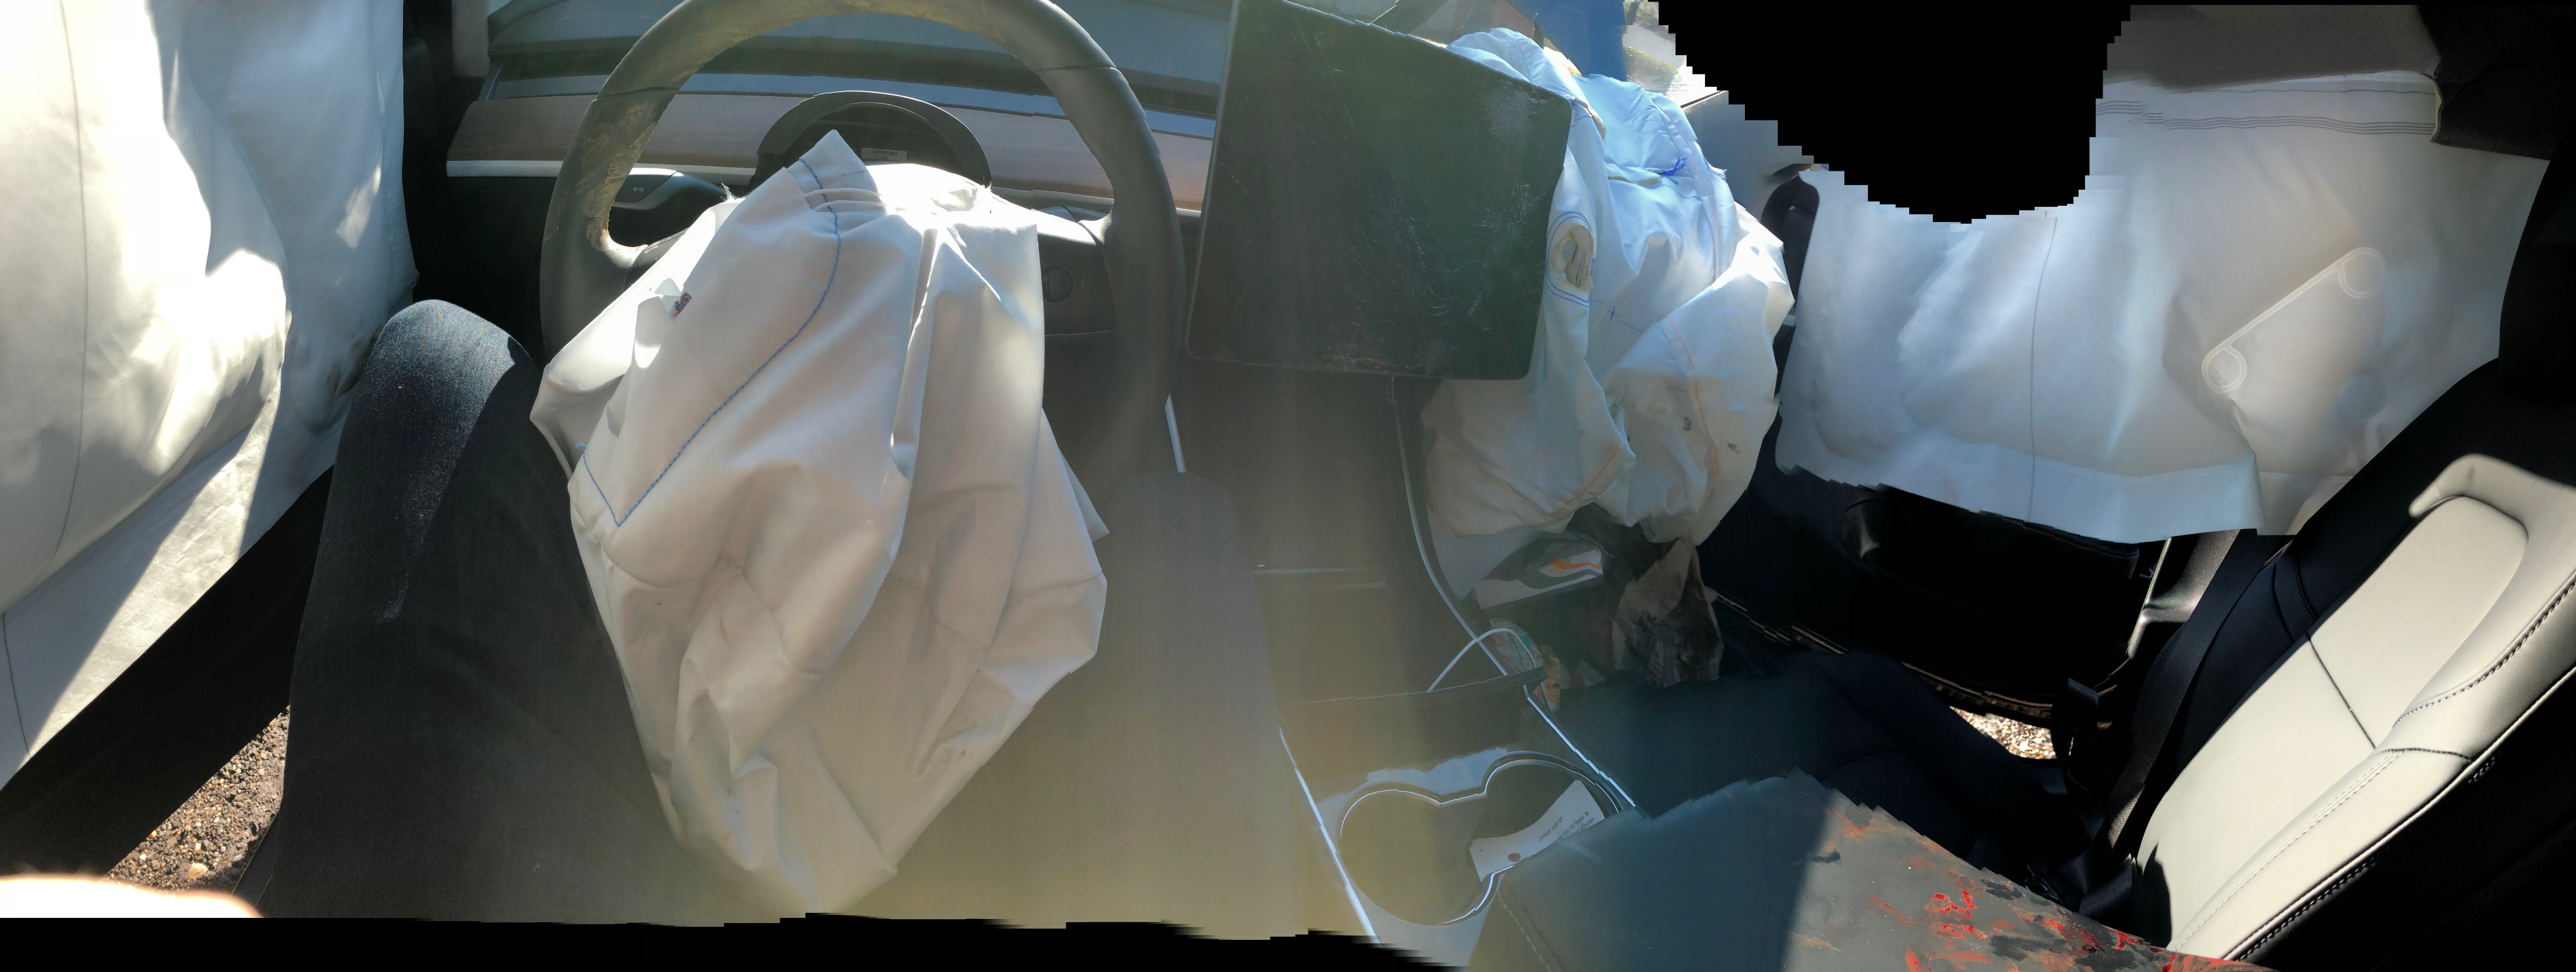 tesla-model-3-crash-accident-airbags